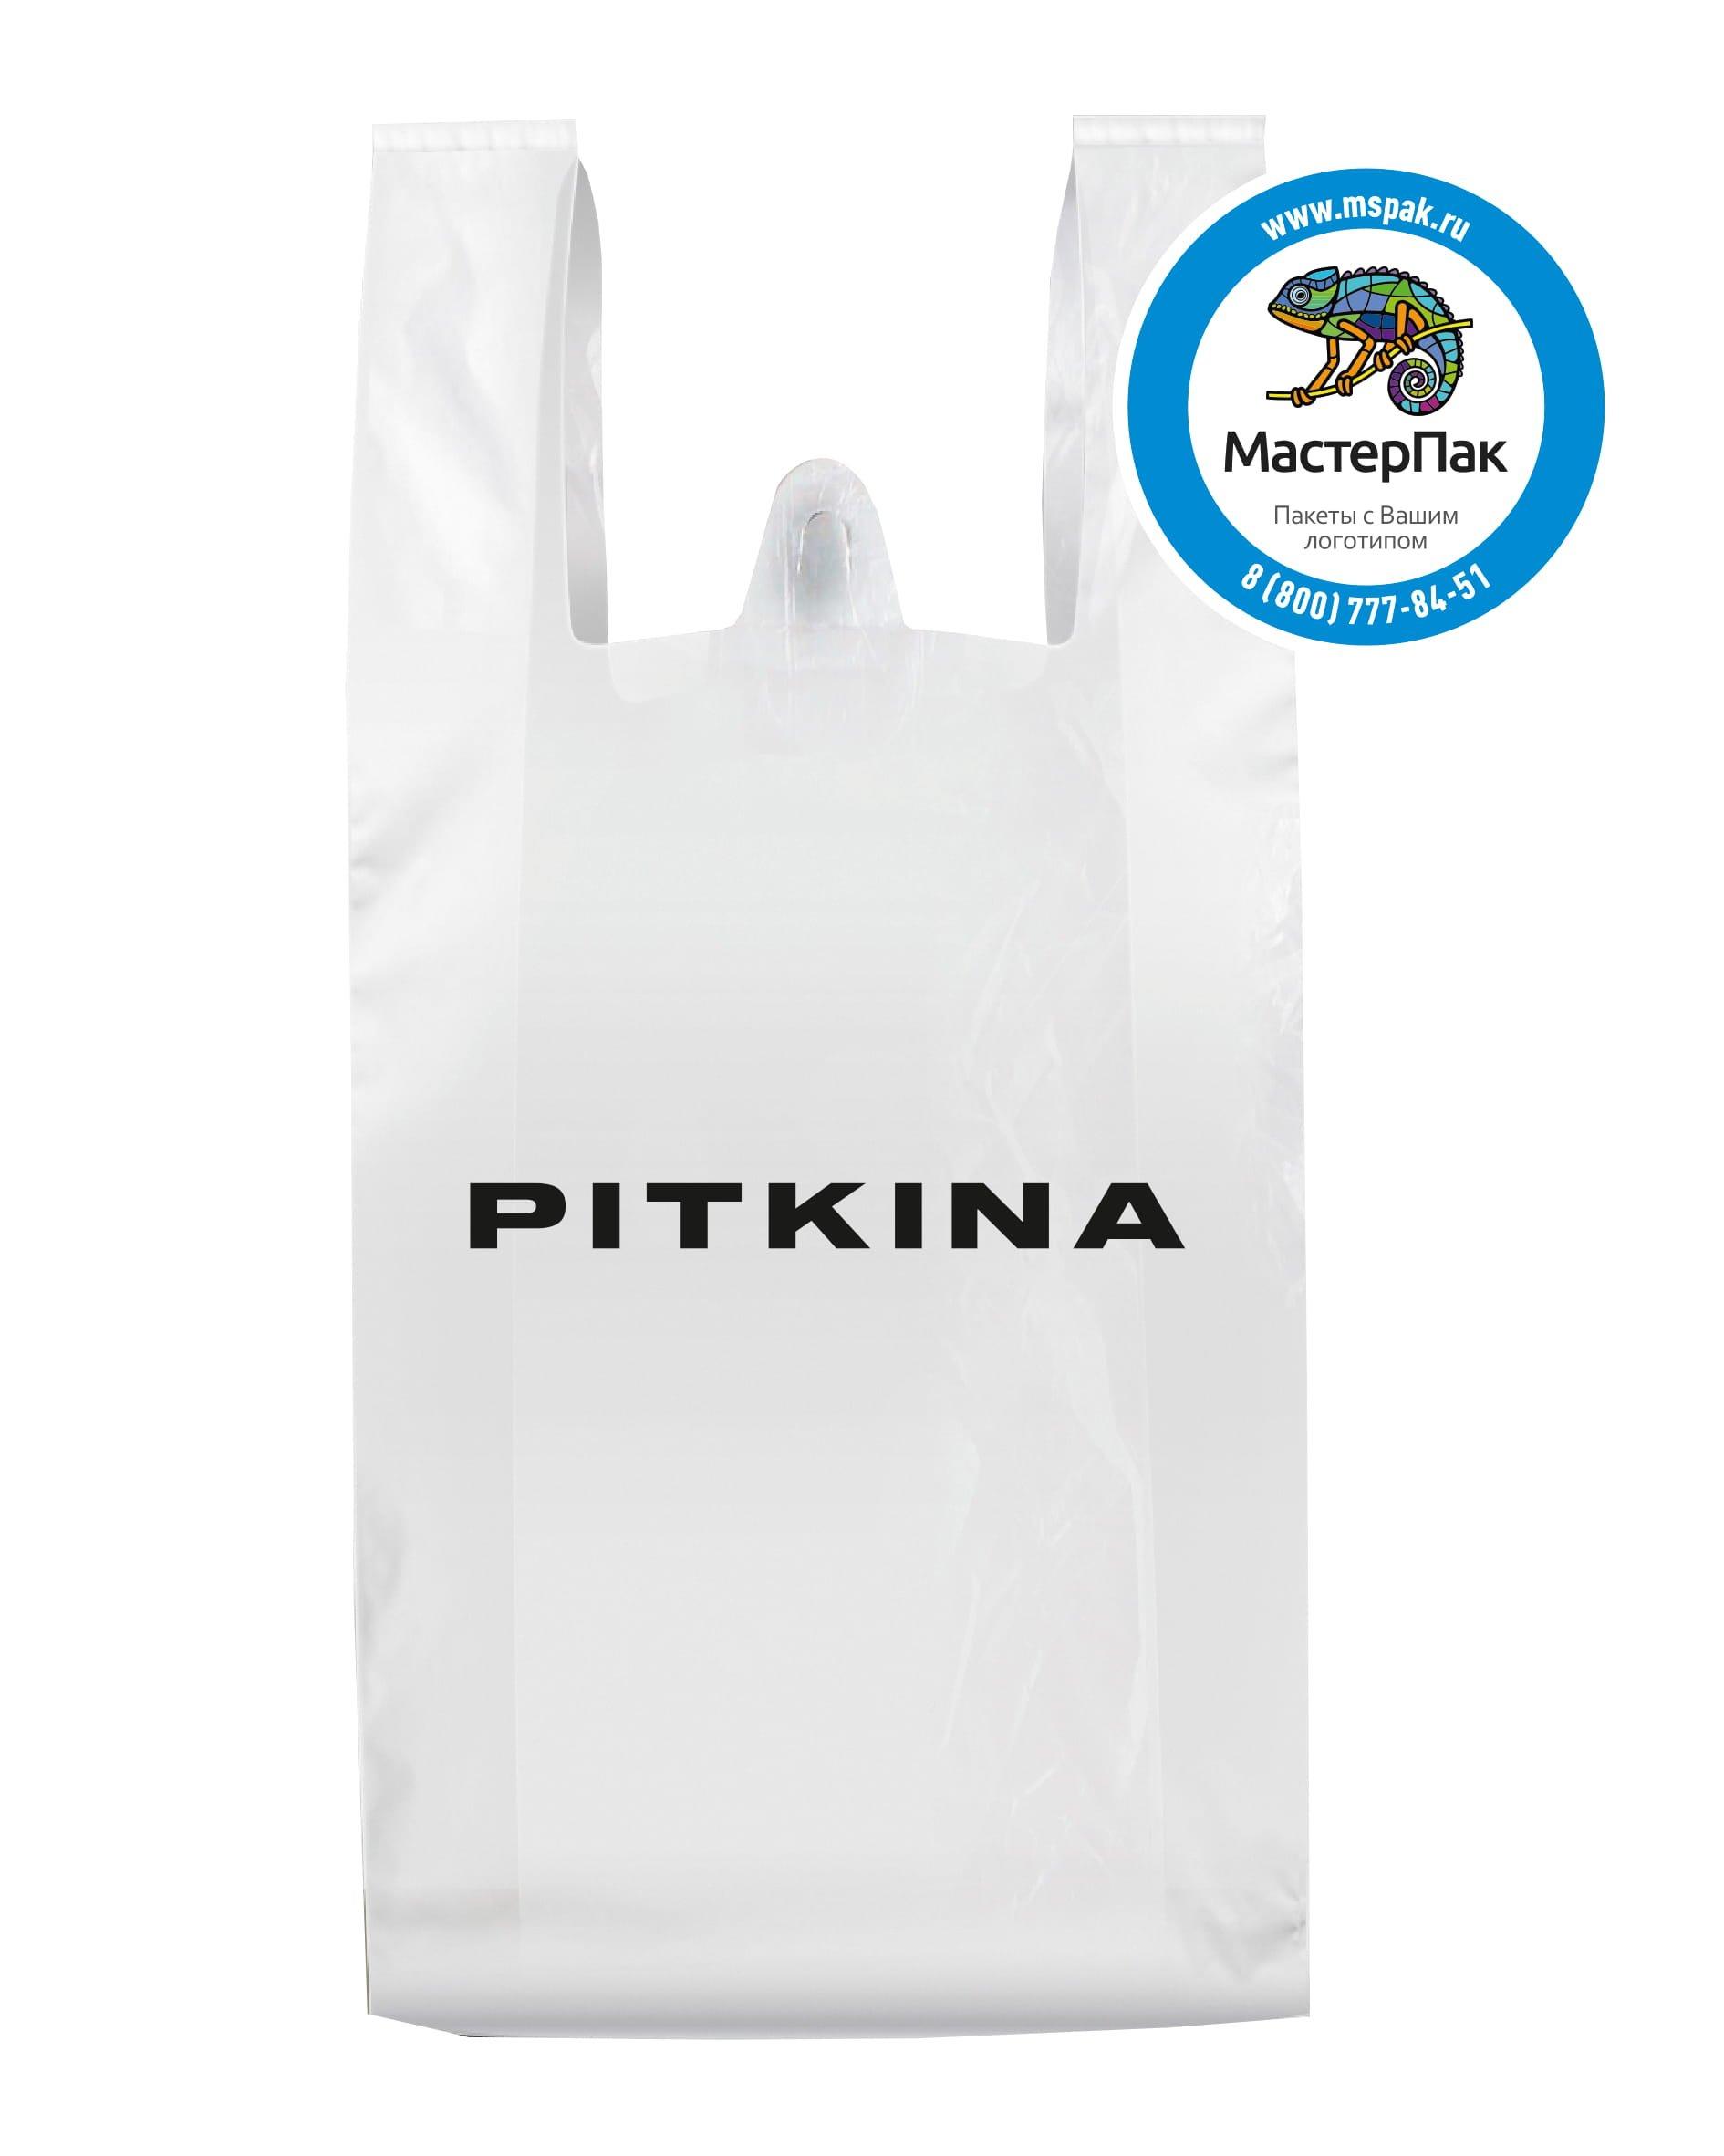 Пакет-майка ПНД с логотипом Pitkina, Москва, 40*60 см, 28 мкм